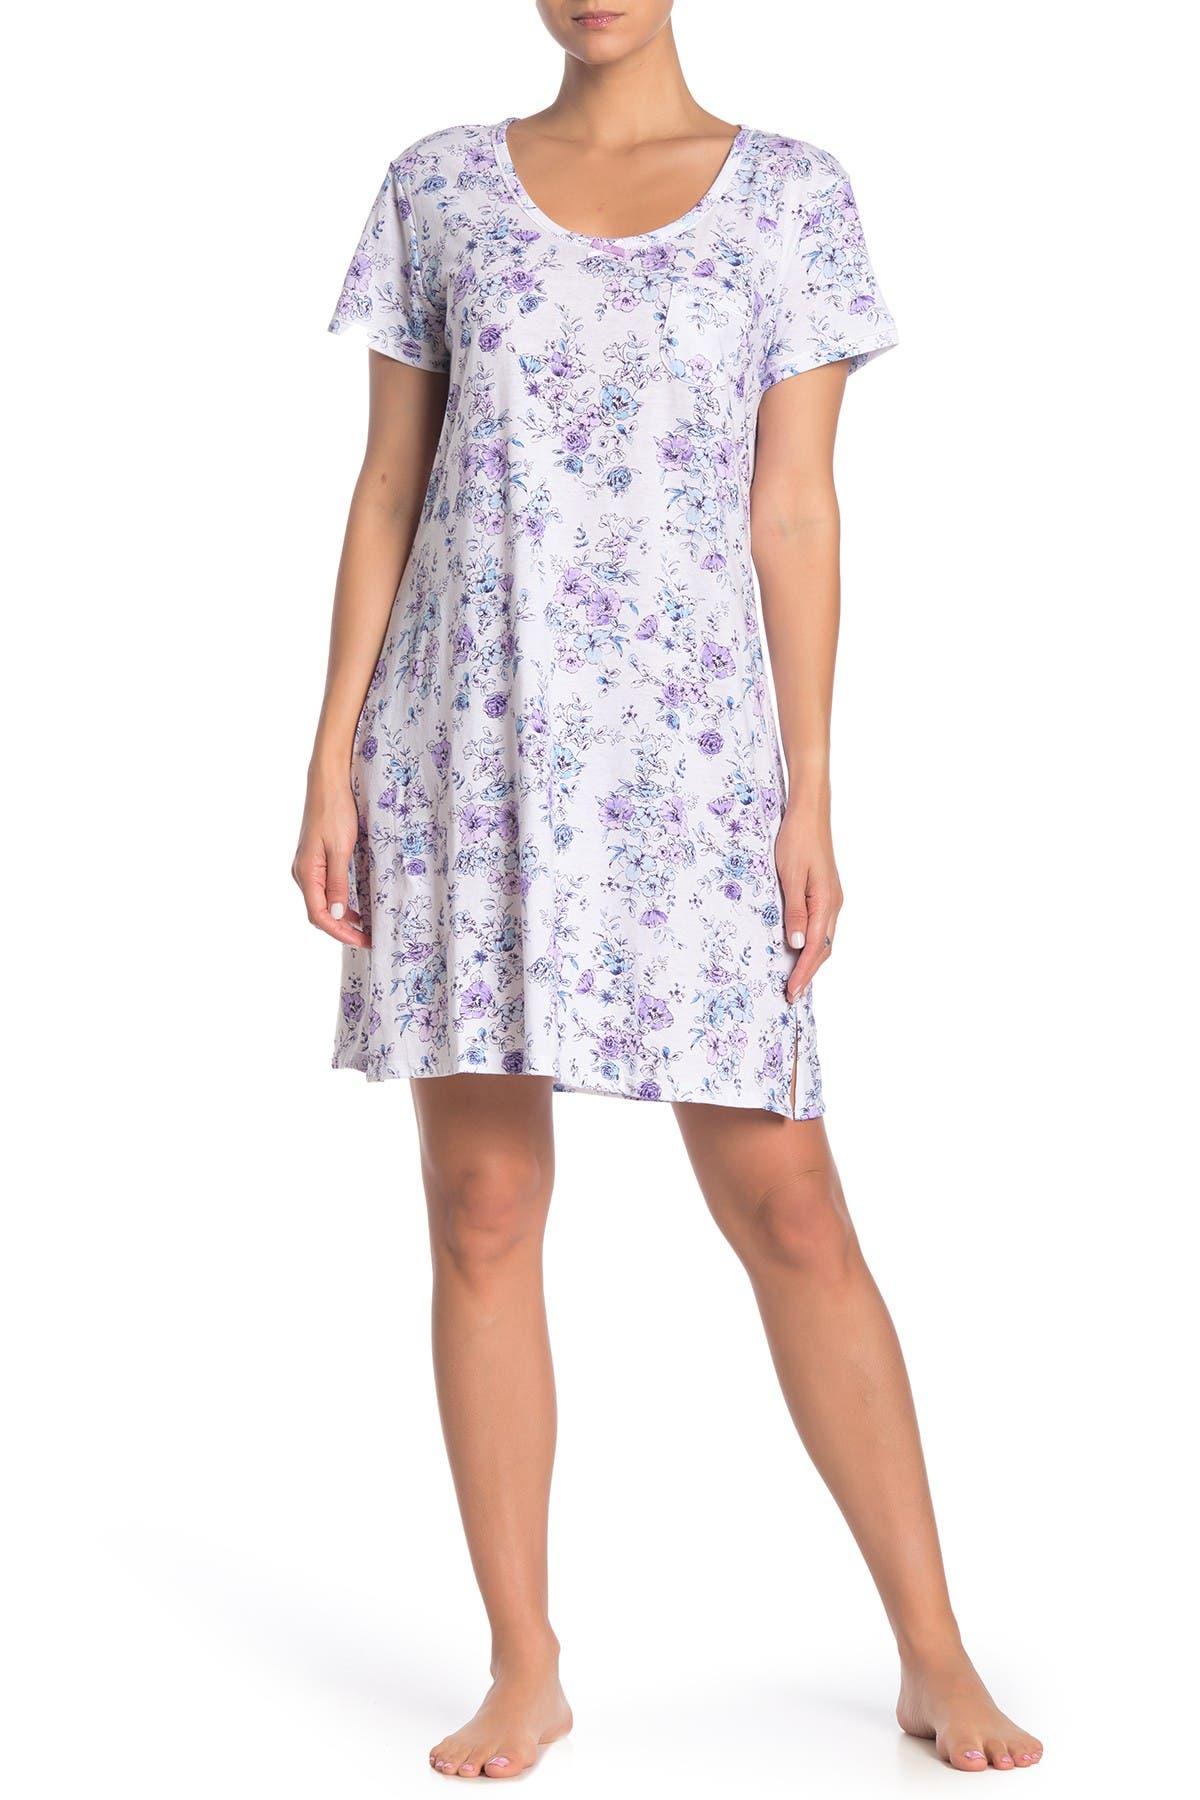 Carole Hochman Short Sleeve Pocket Nightgown